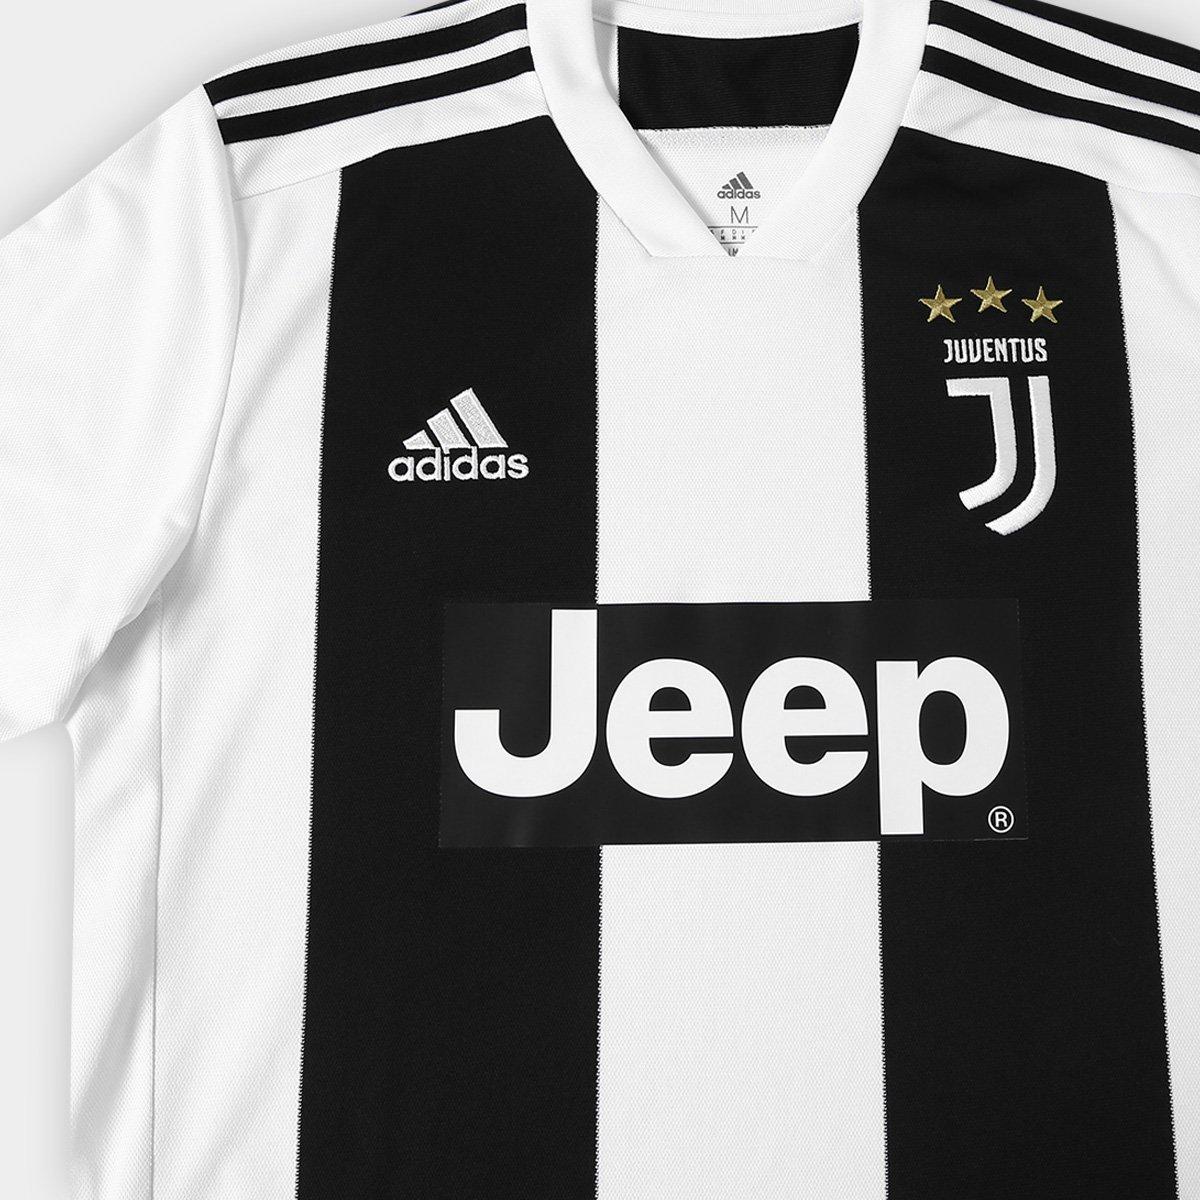 d70e3224ca Camisa Juventus Home 2018 s n° - Torcedor Adidas Masculina - Compre ...